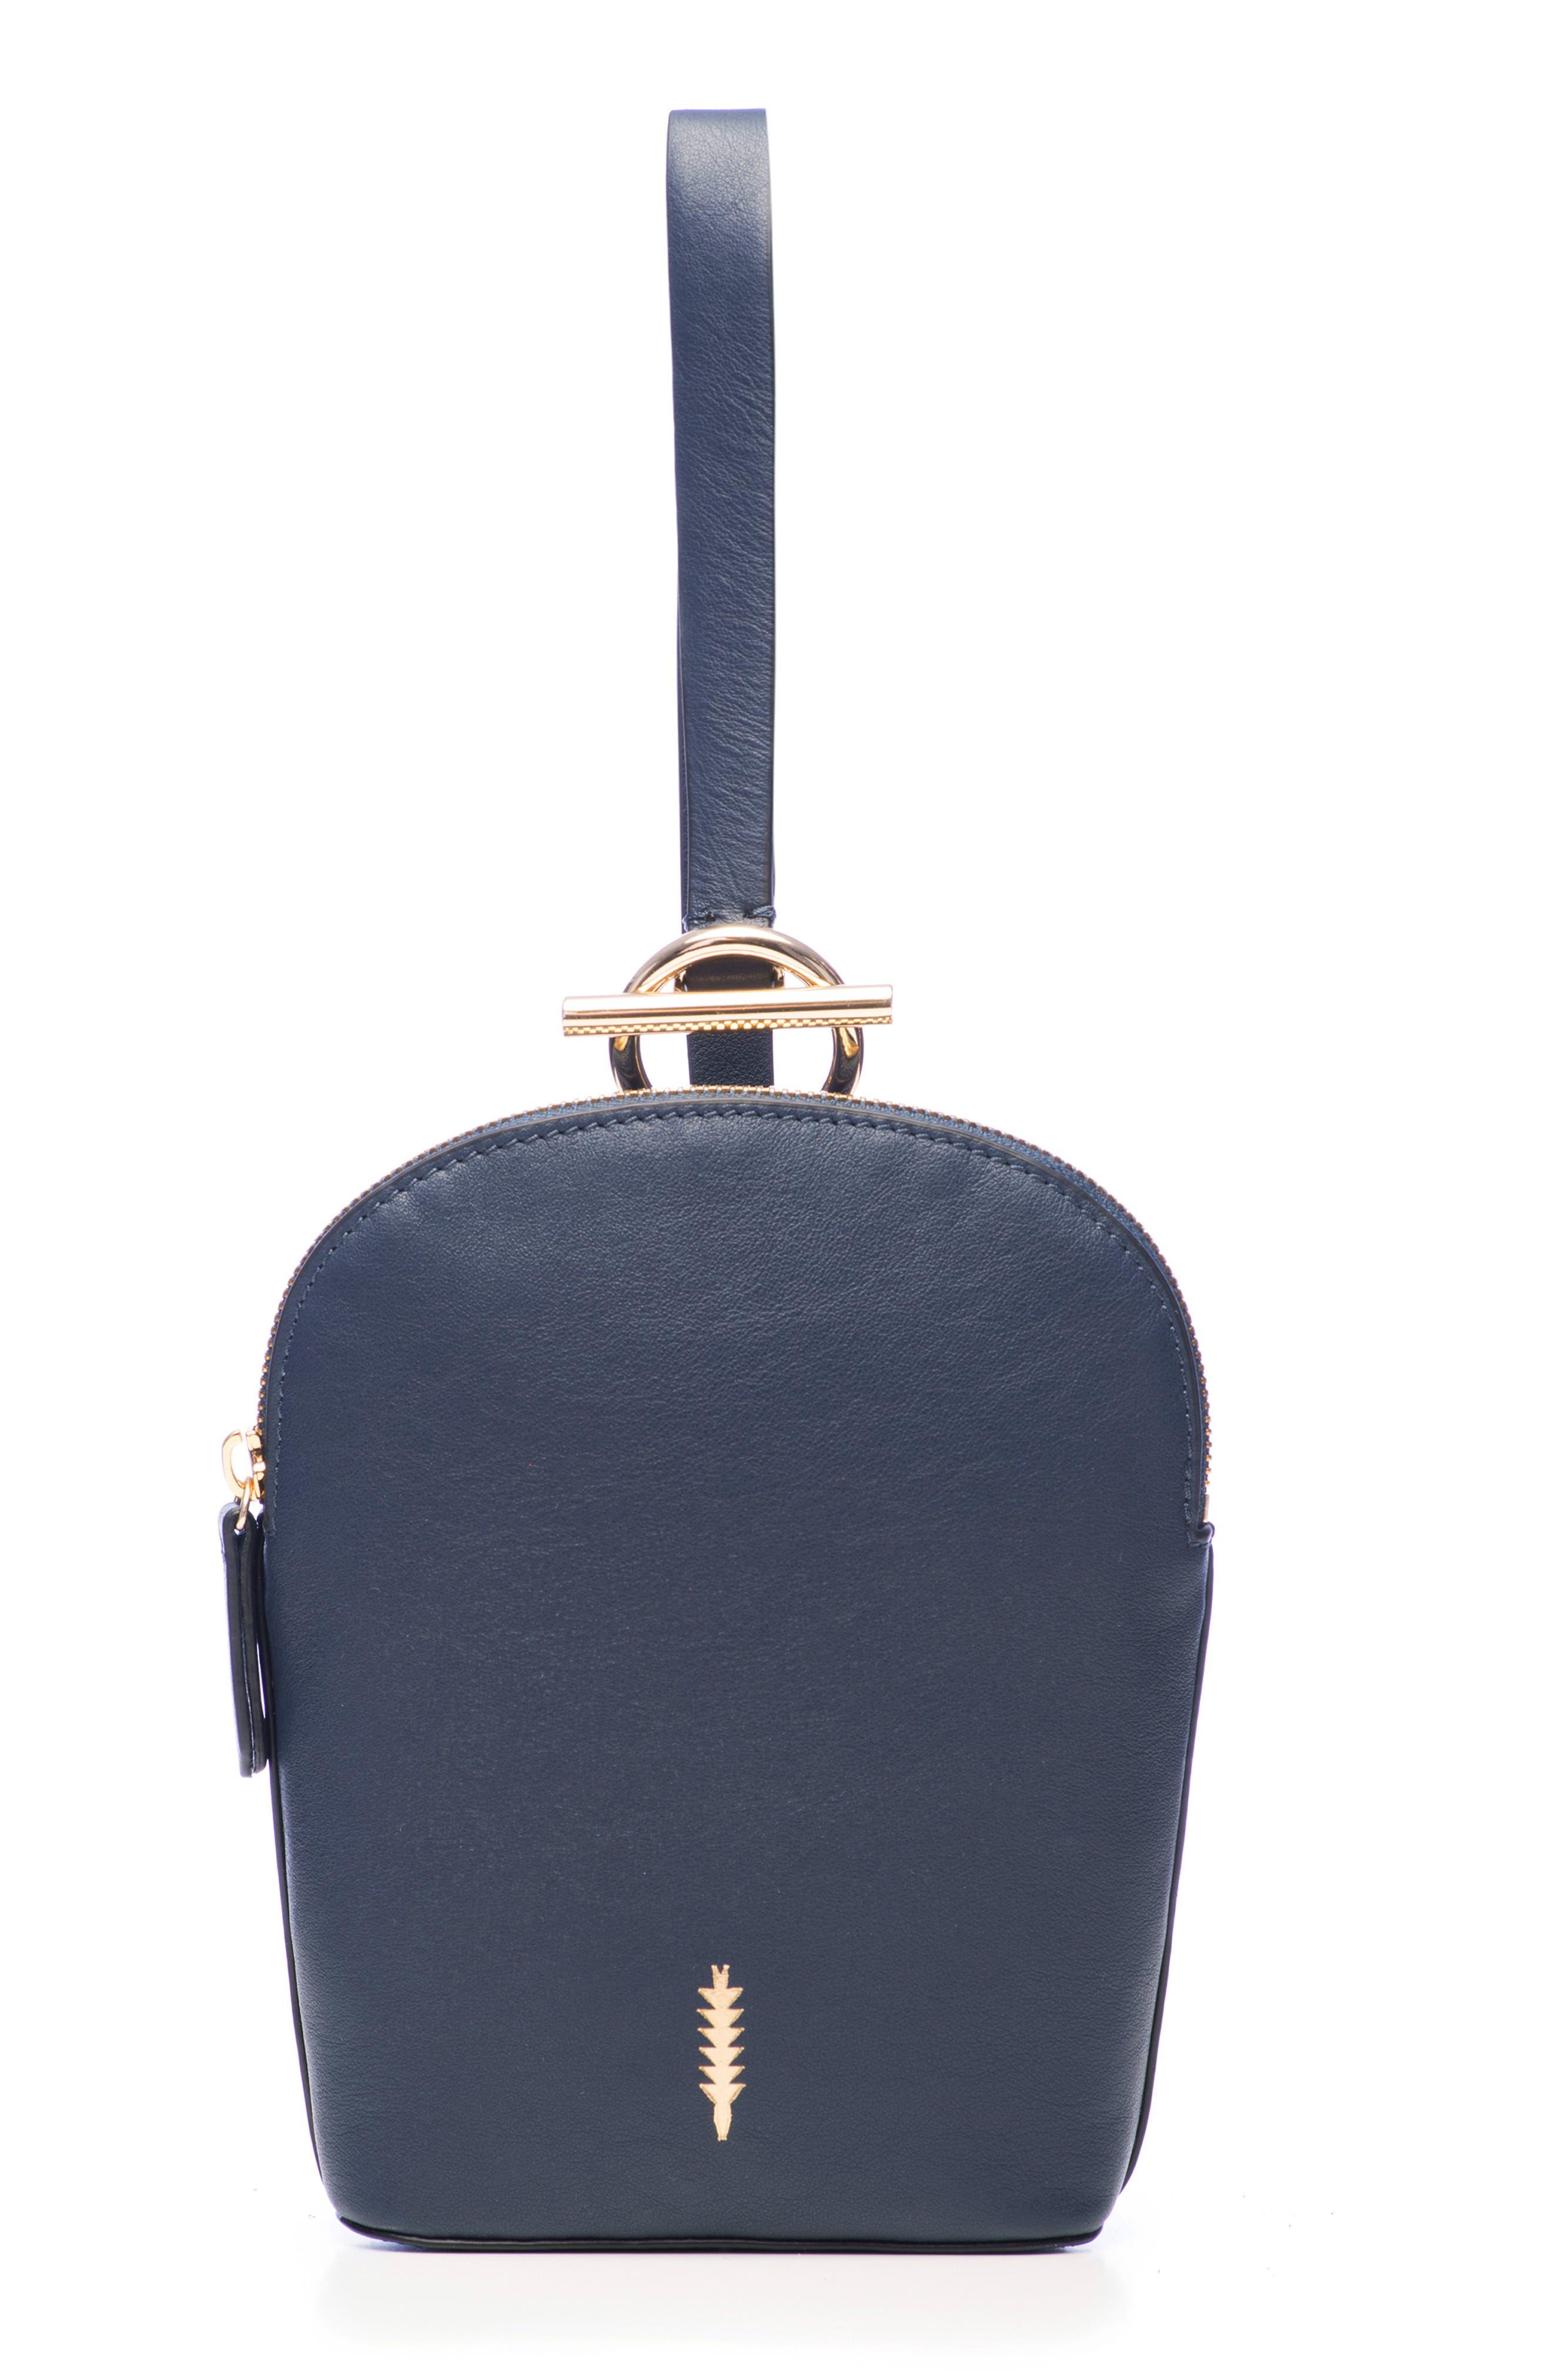 Thacker Ava Leather Wristlet - Blue